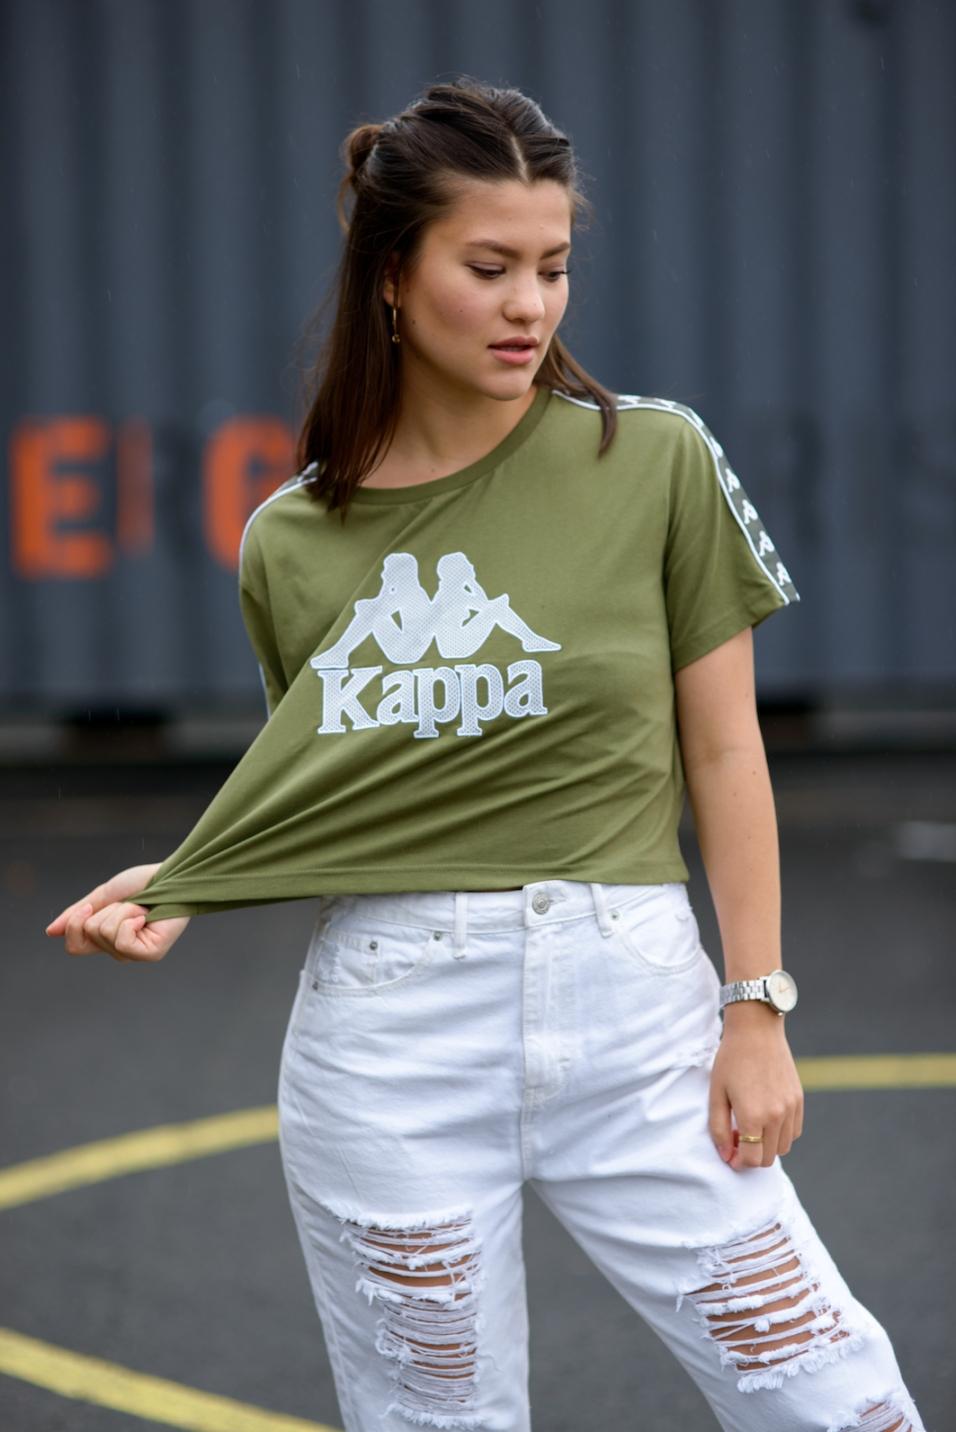 kappa look kappakrew blog mode fashion blogger22